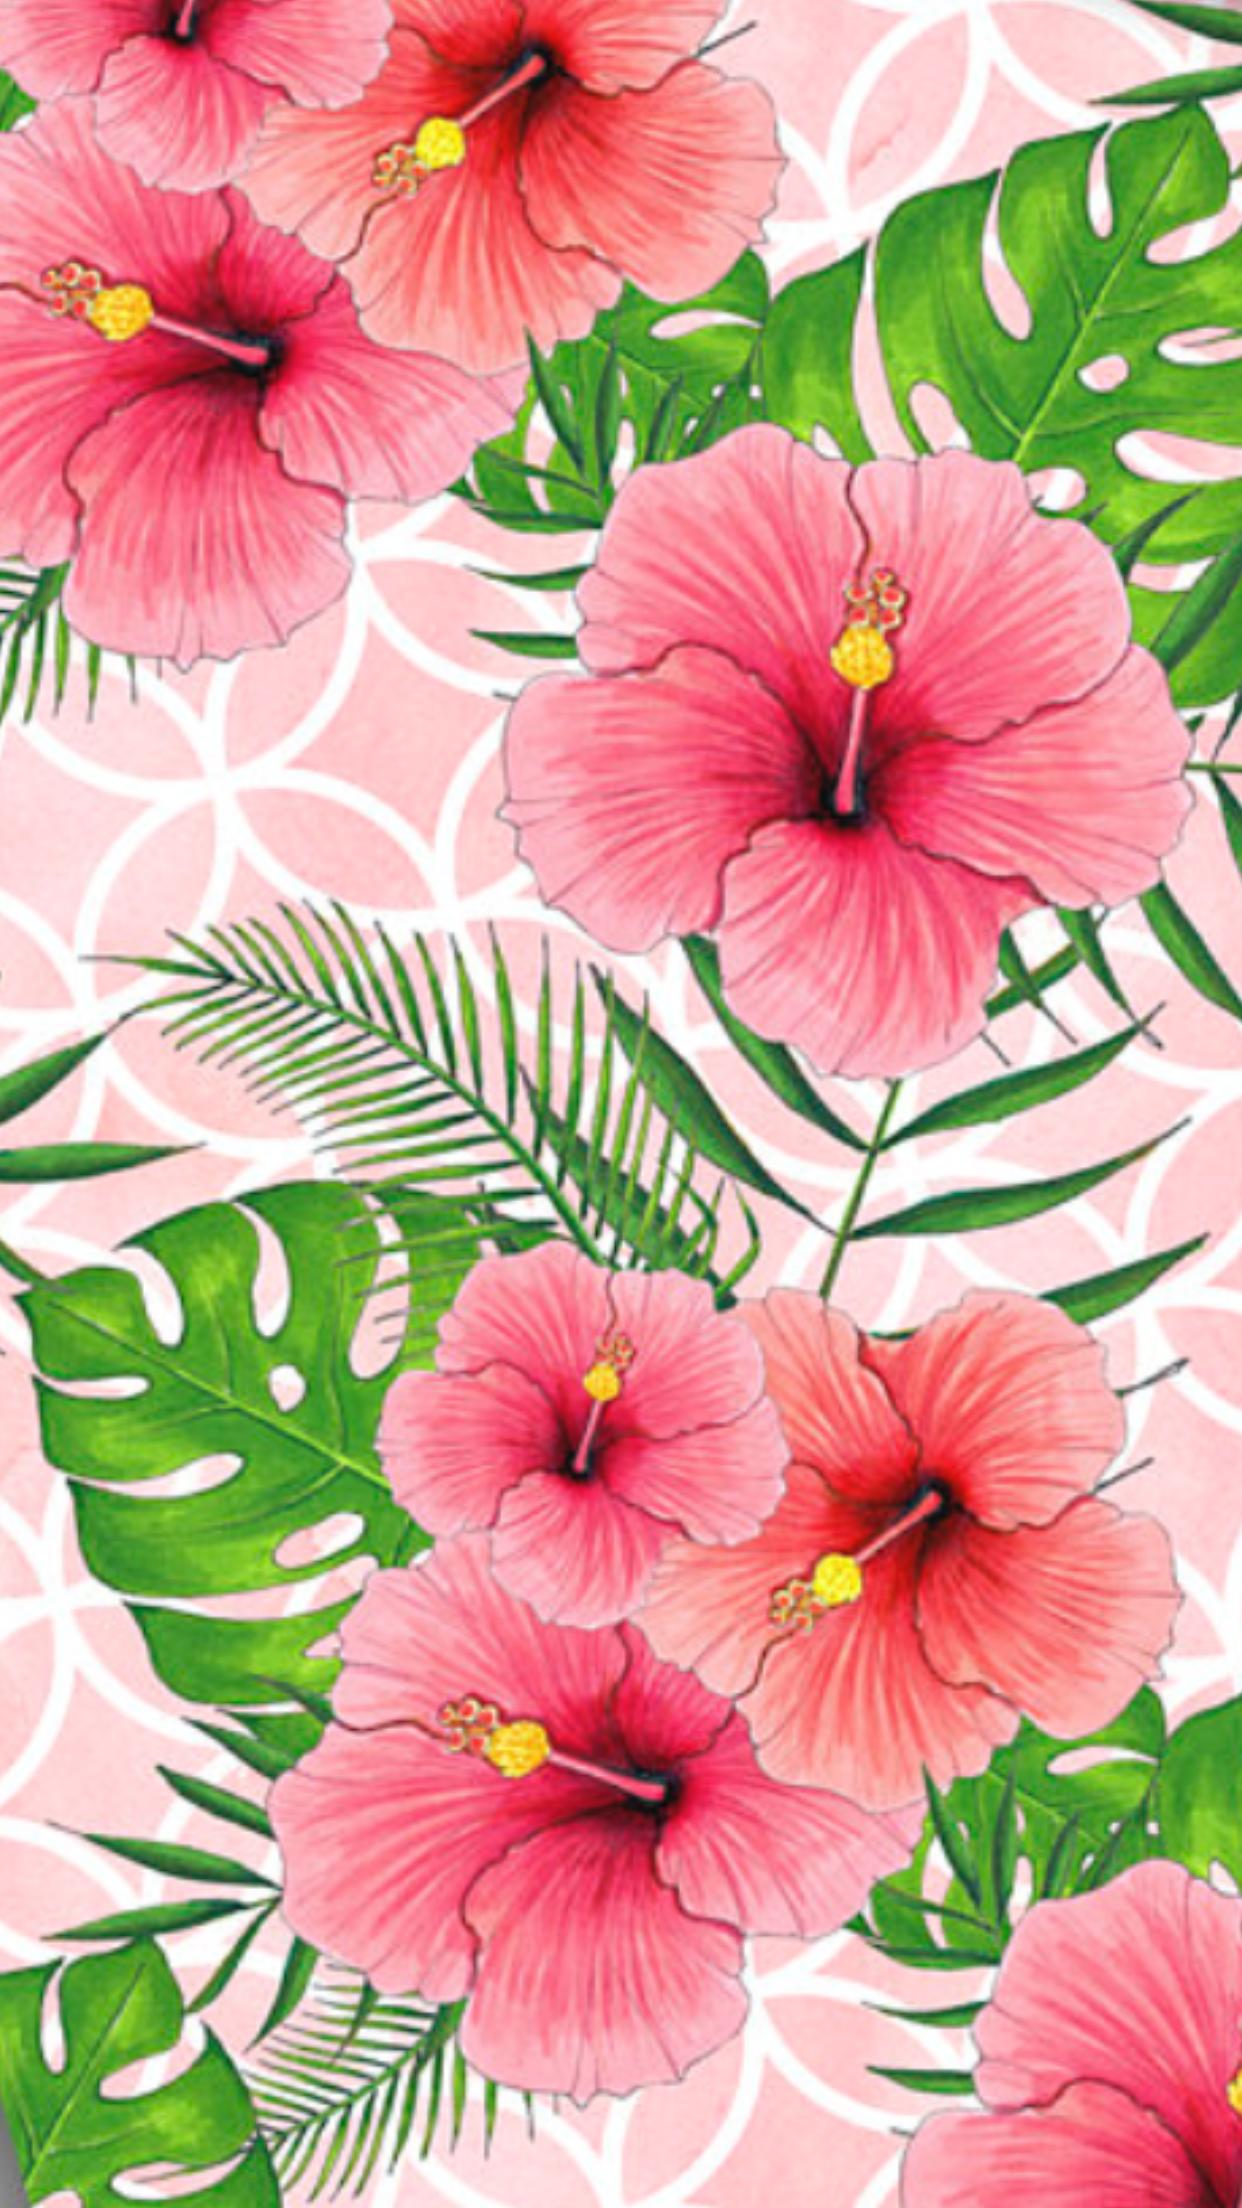 Tropical Floral Pattern Flower Wallpaper Flower Painting Flower Iphone Wallpaper